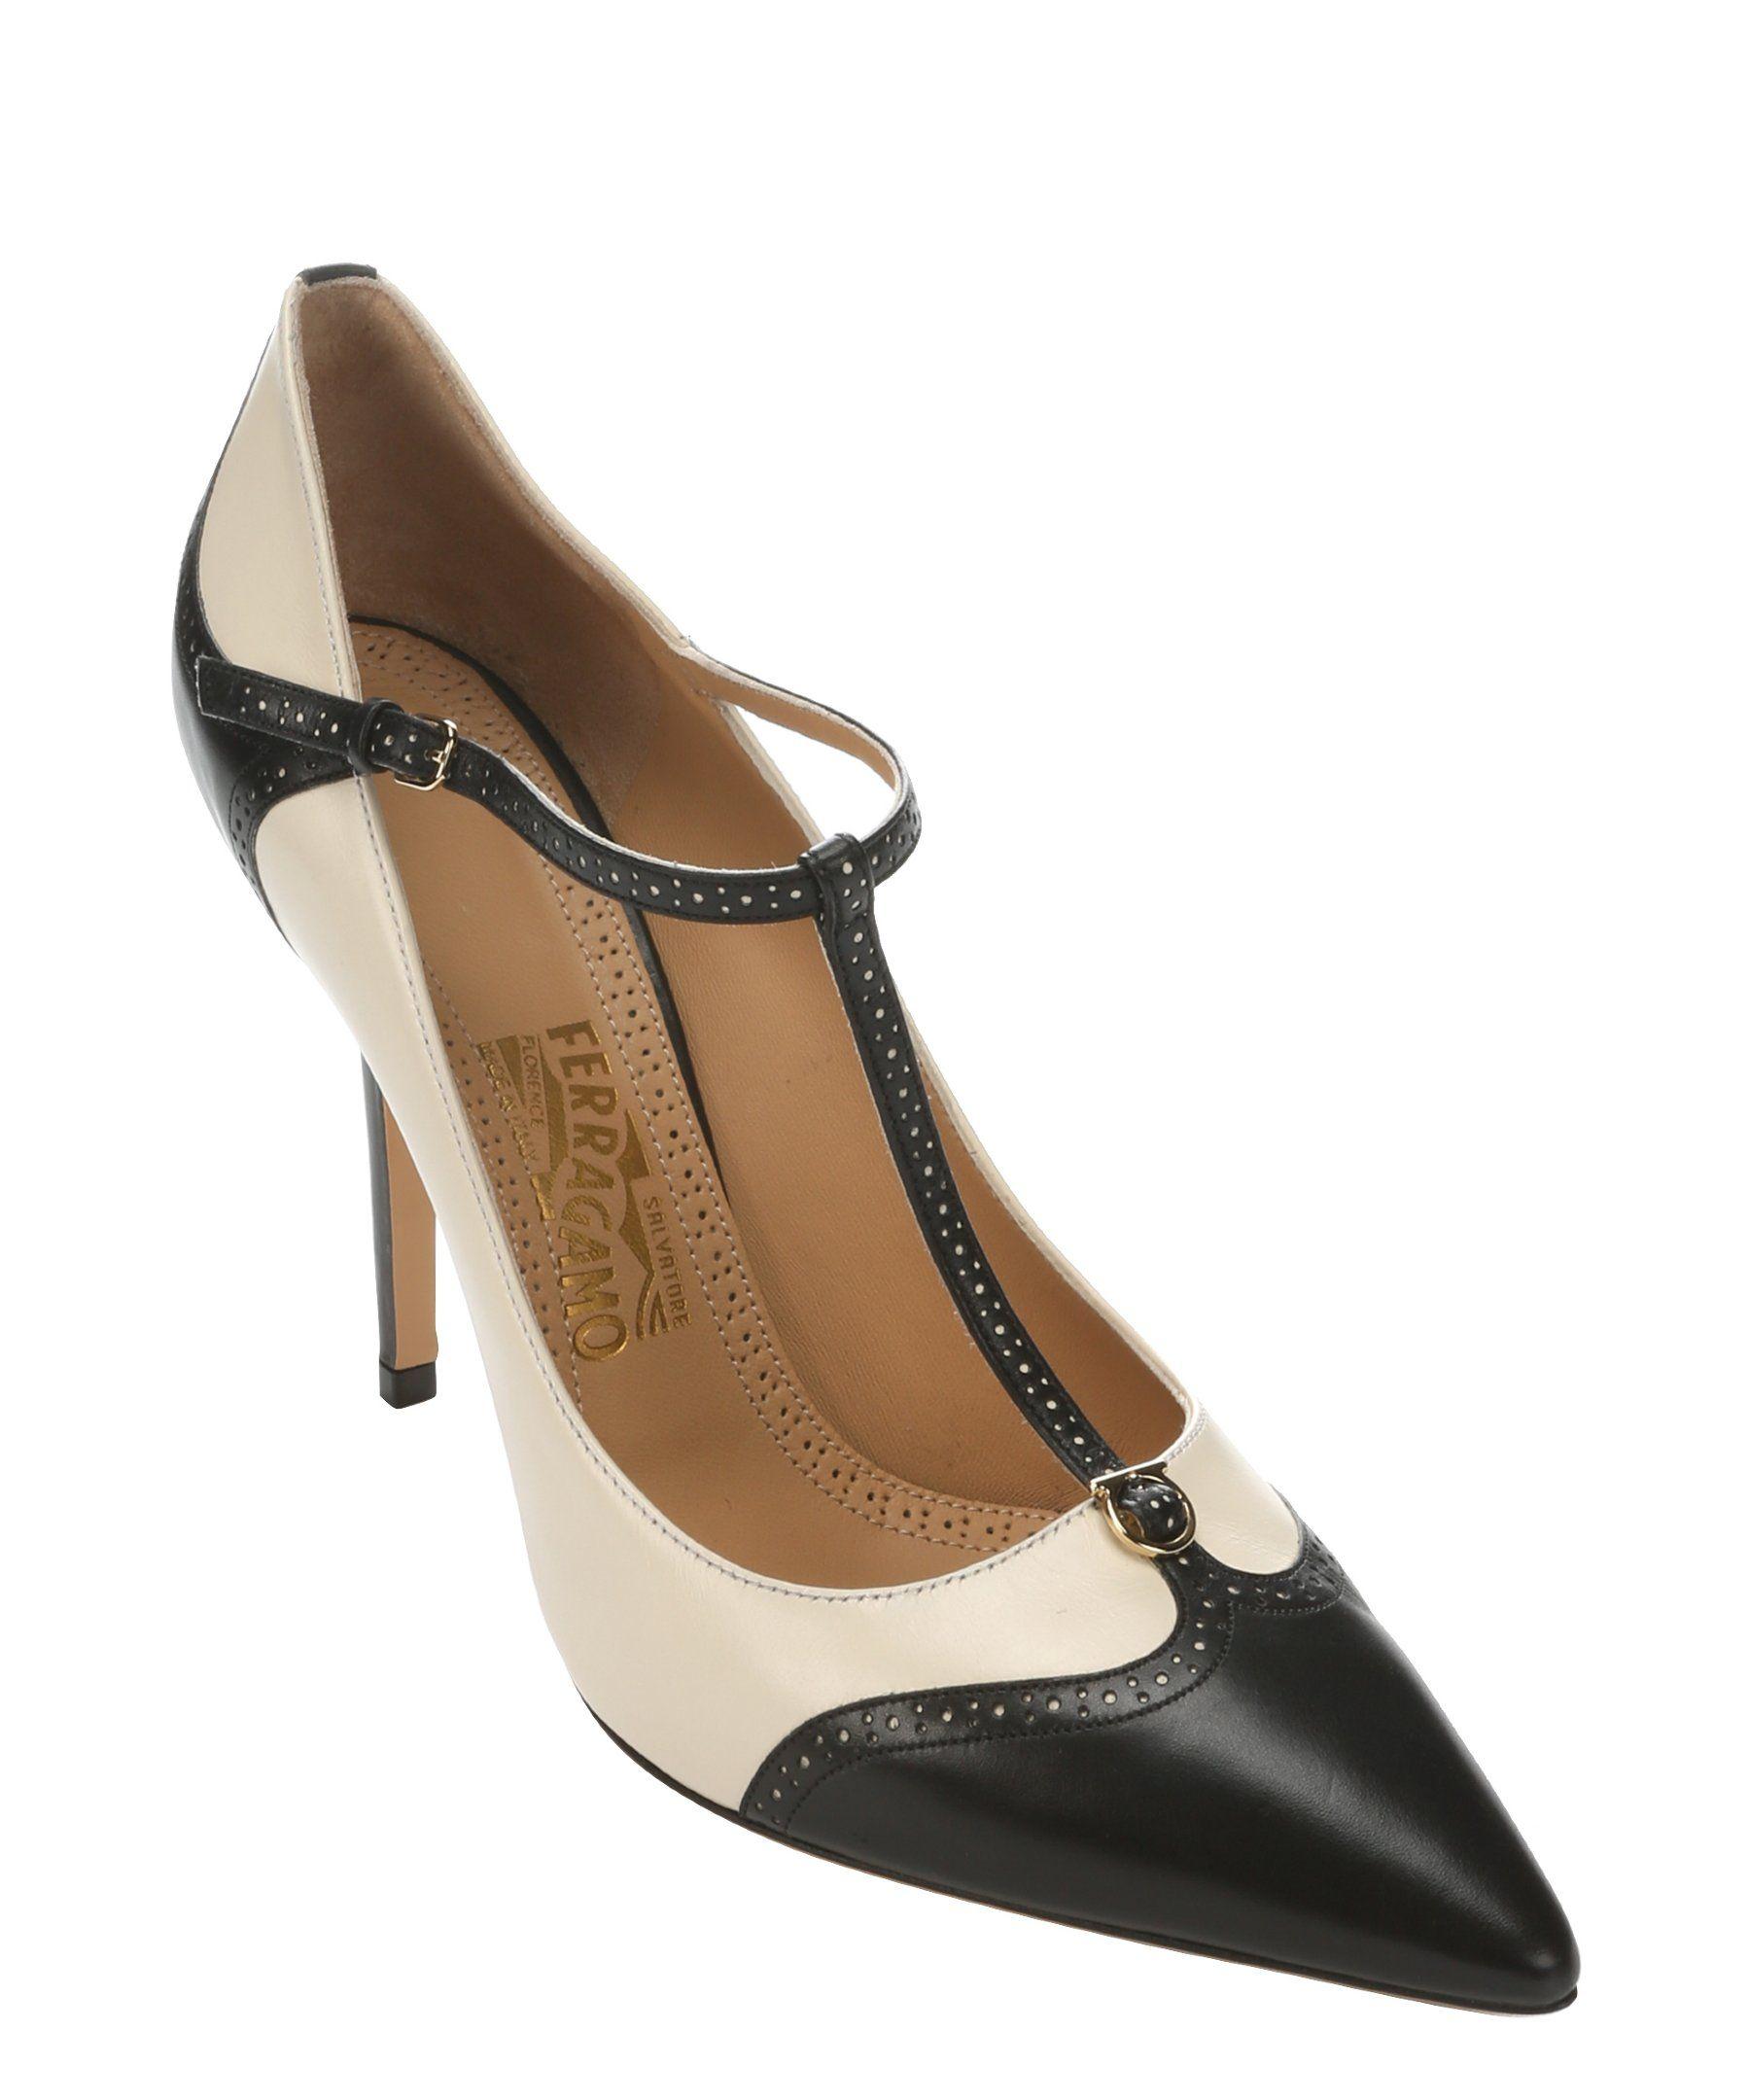 Salvadore Ferragamo Black and Beige Nalia T-Strap Heel